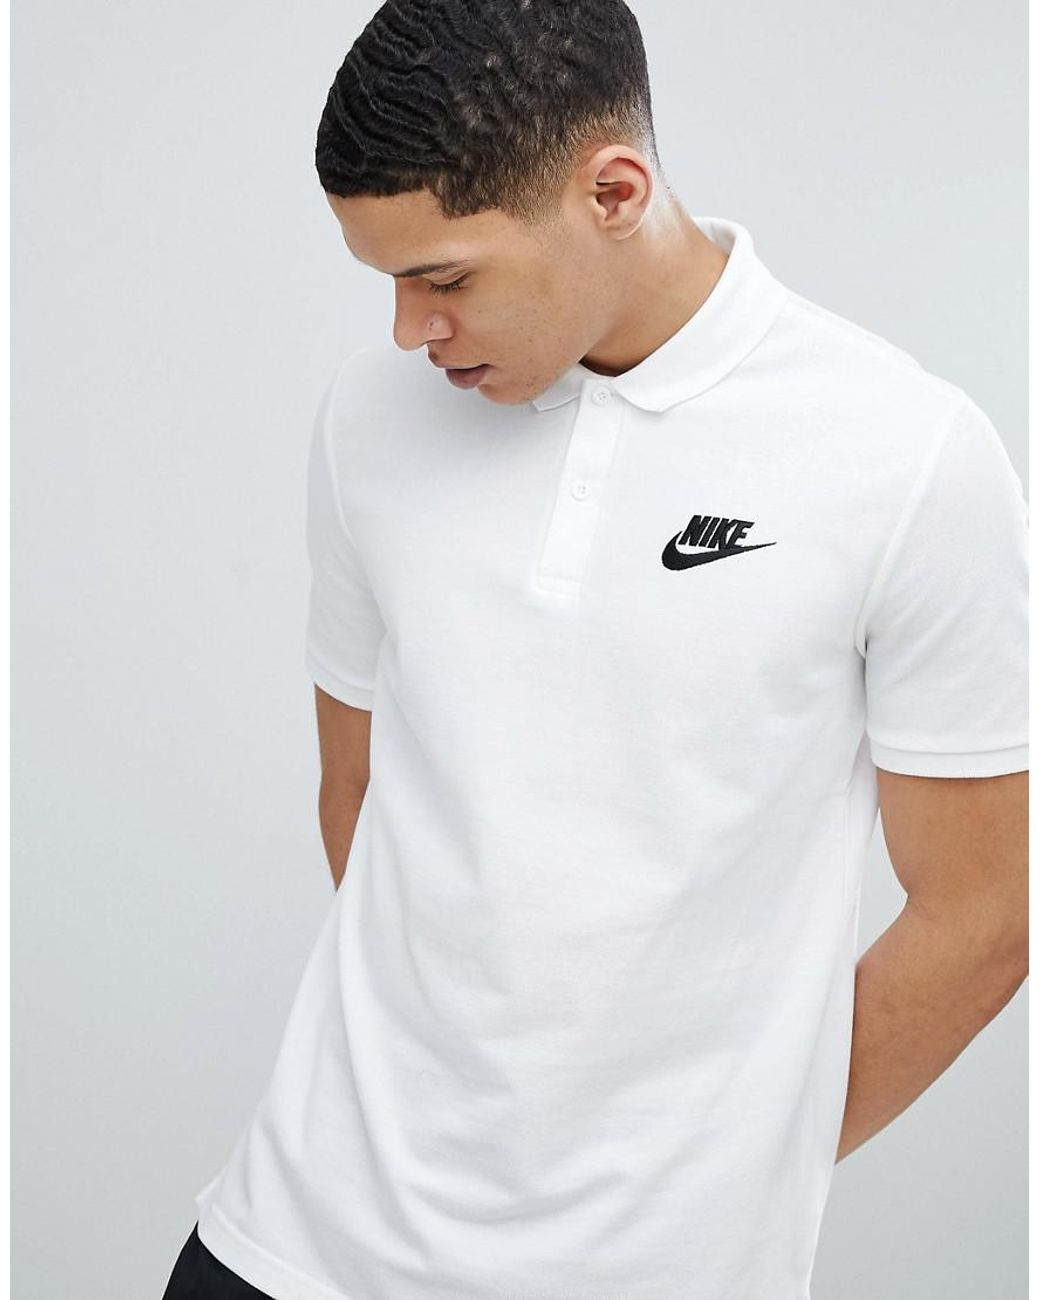 nike air max cheap thea, Nike matchup striped polo in grey